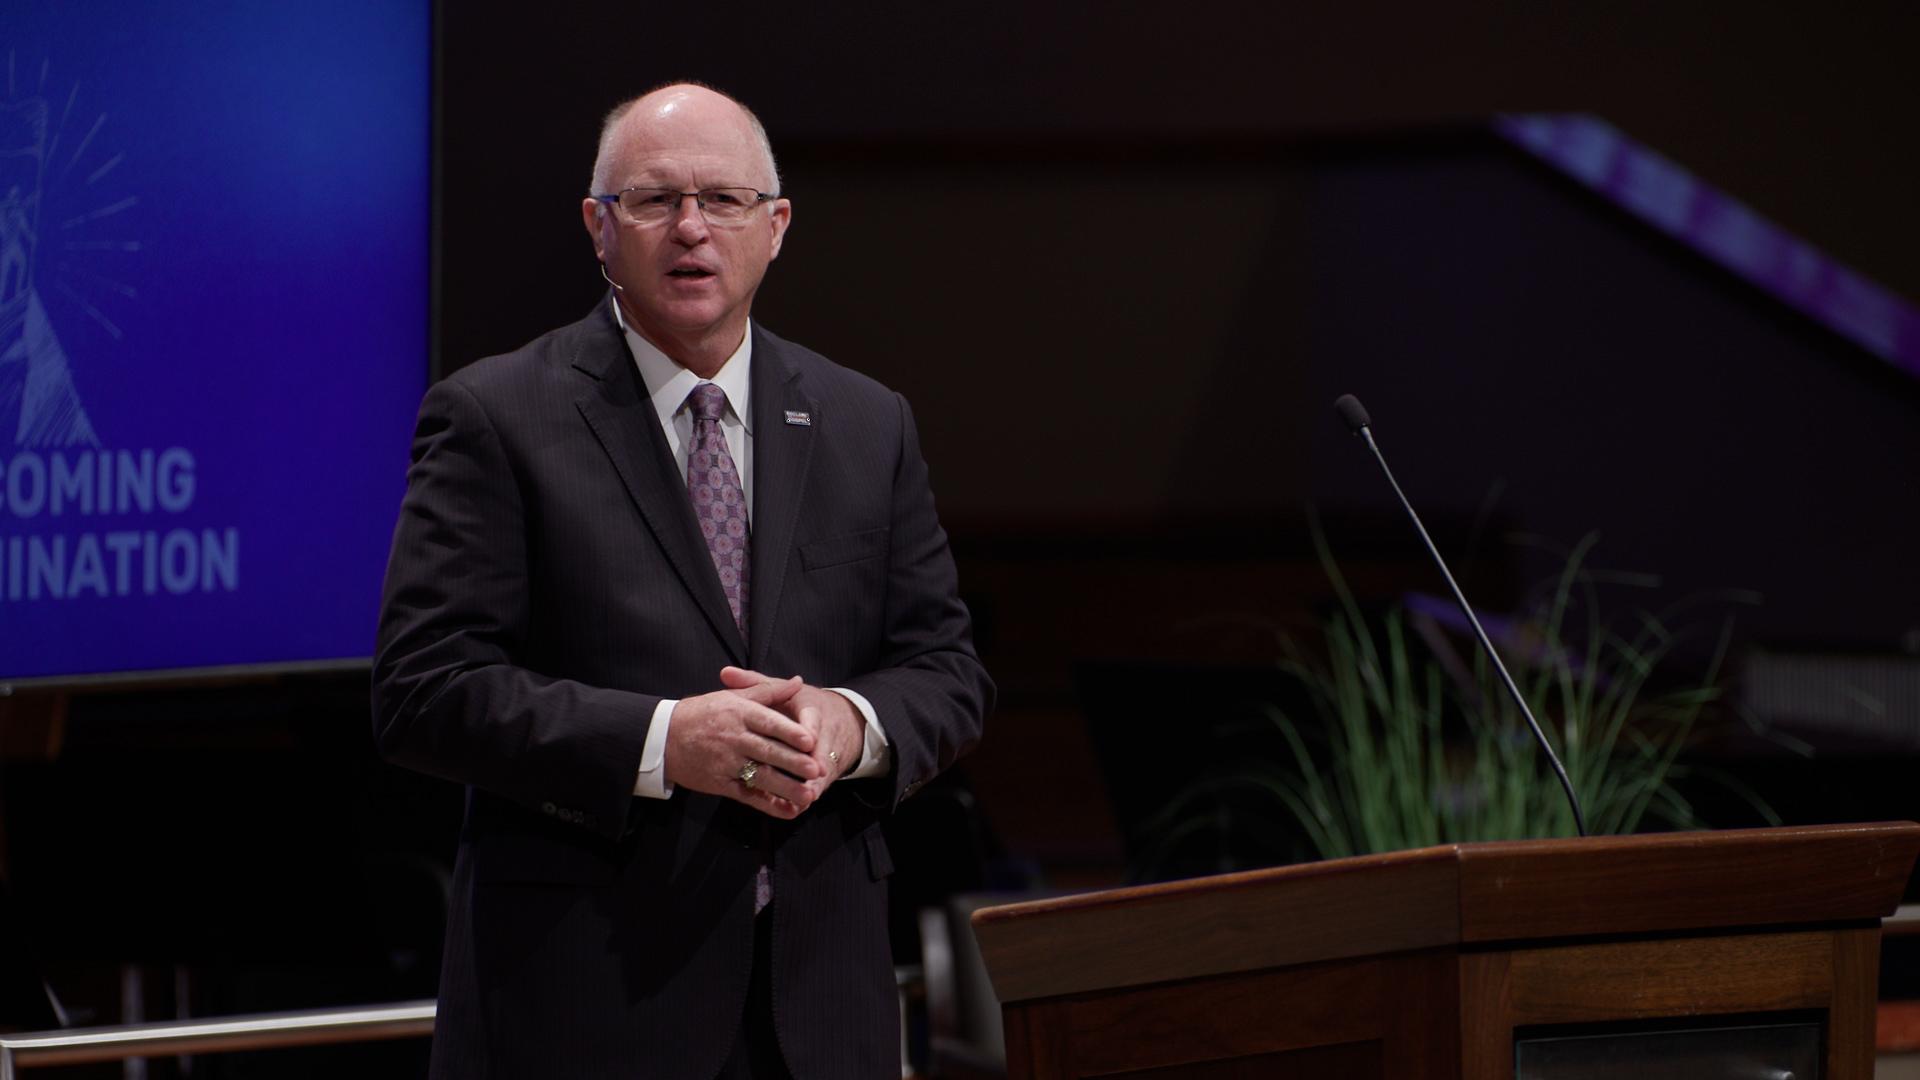 Pastor Paul Chappell: Overcoming Discrimination